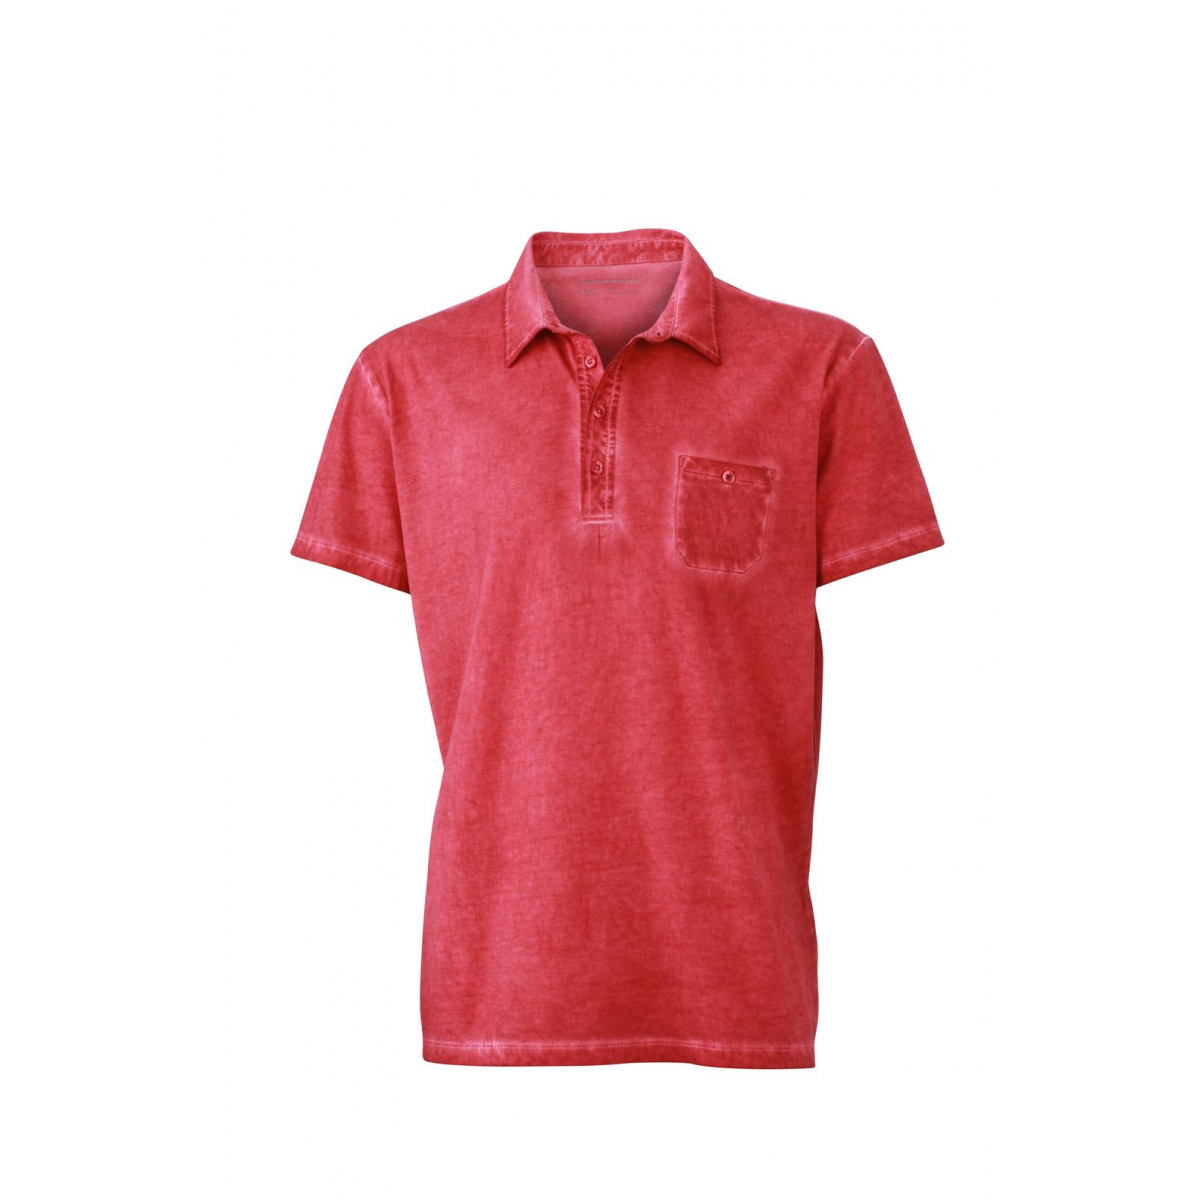 Рубашка поло мужская JN988 Mens Gipsy Polo - Красный